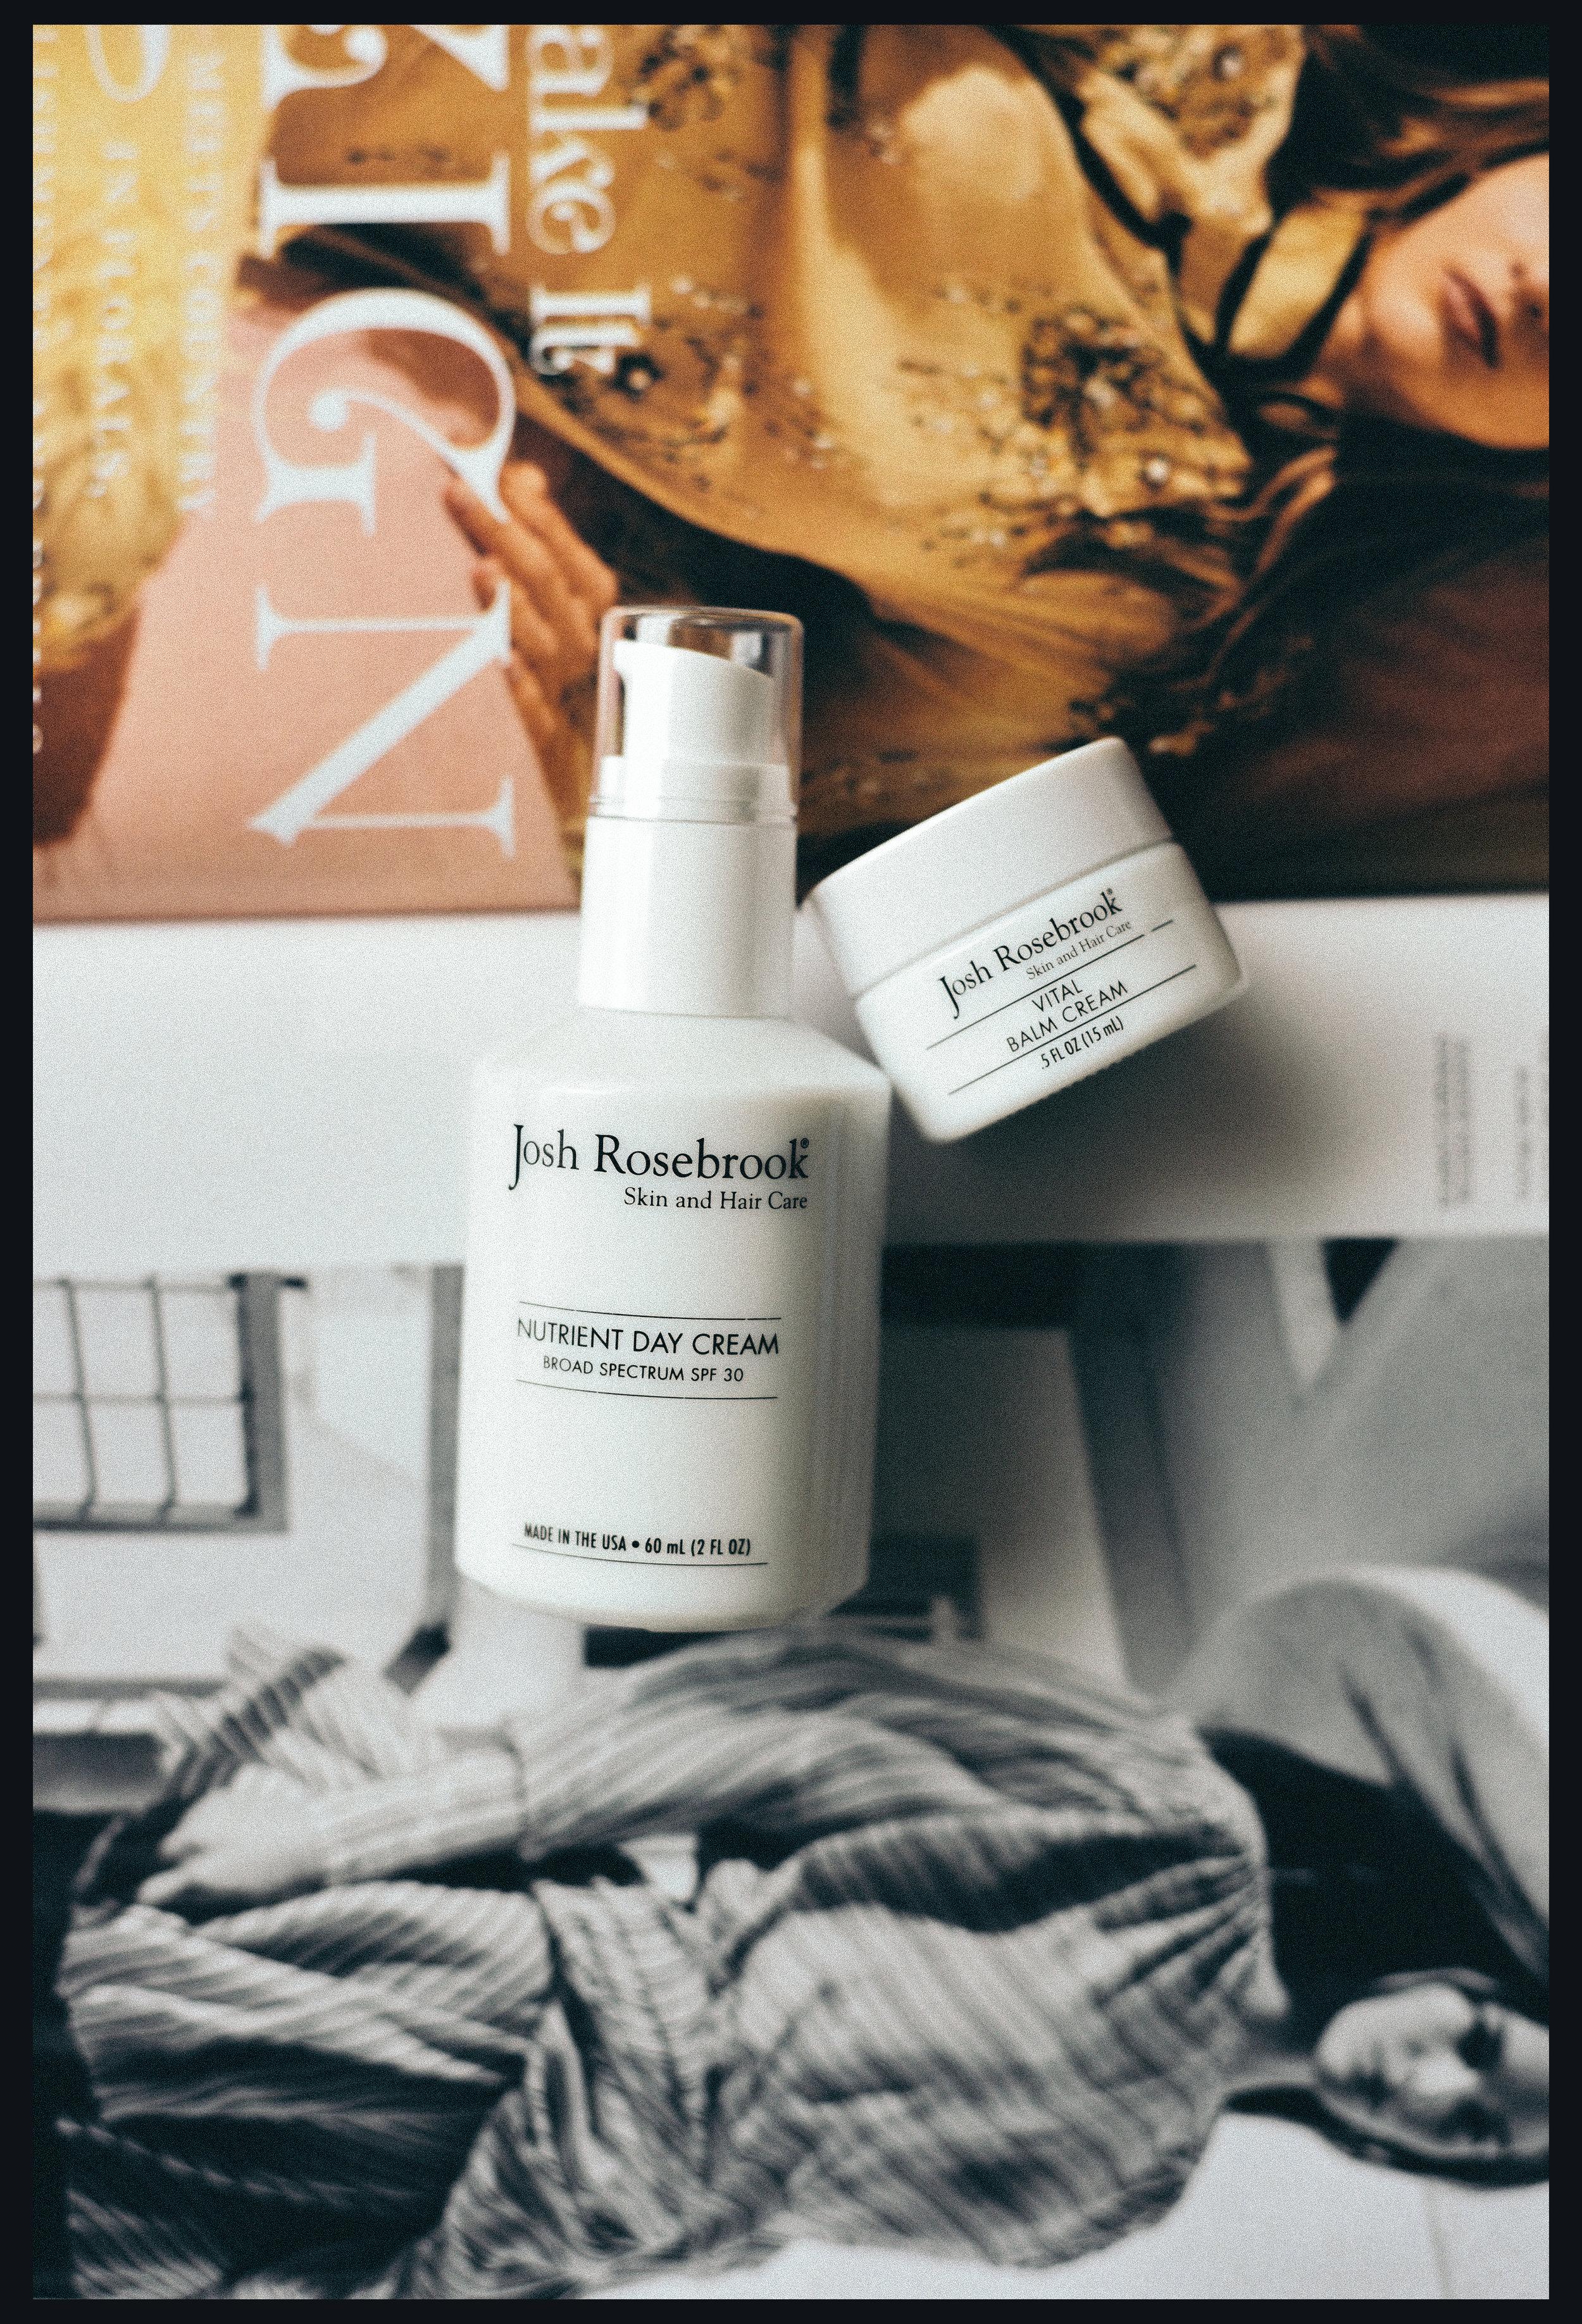 Beauty Heroes July Box, Josh Rosebrook's Nutrient Day Cream & Vital Balm Cream